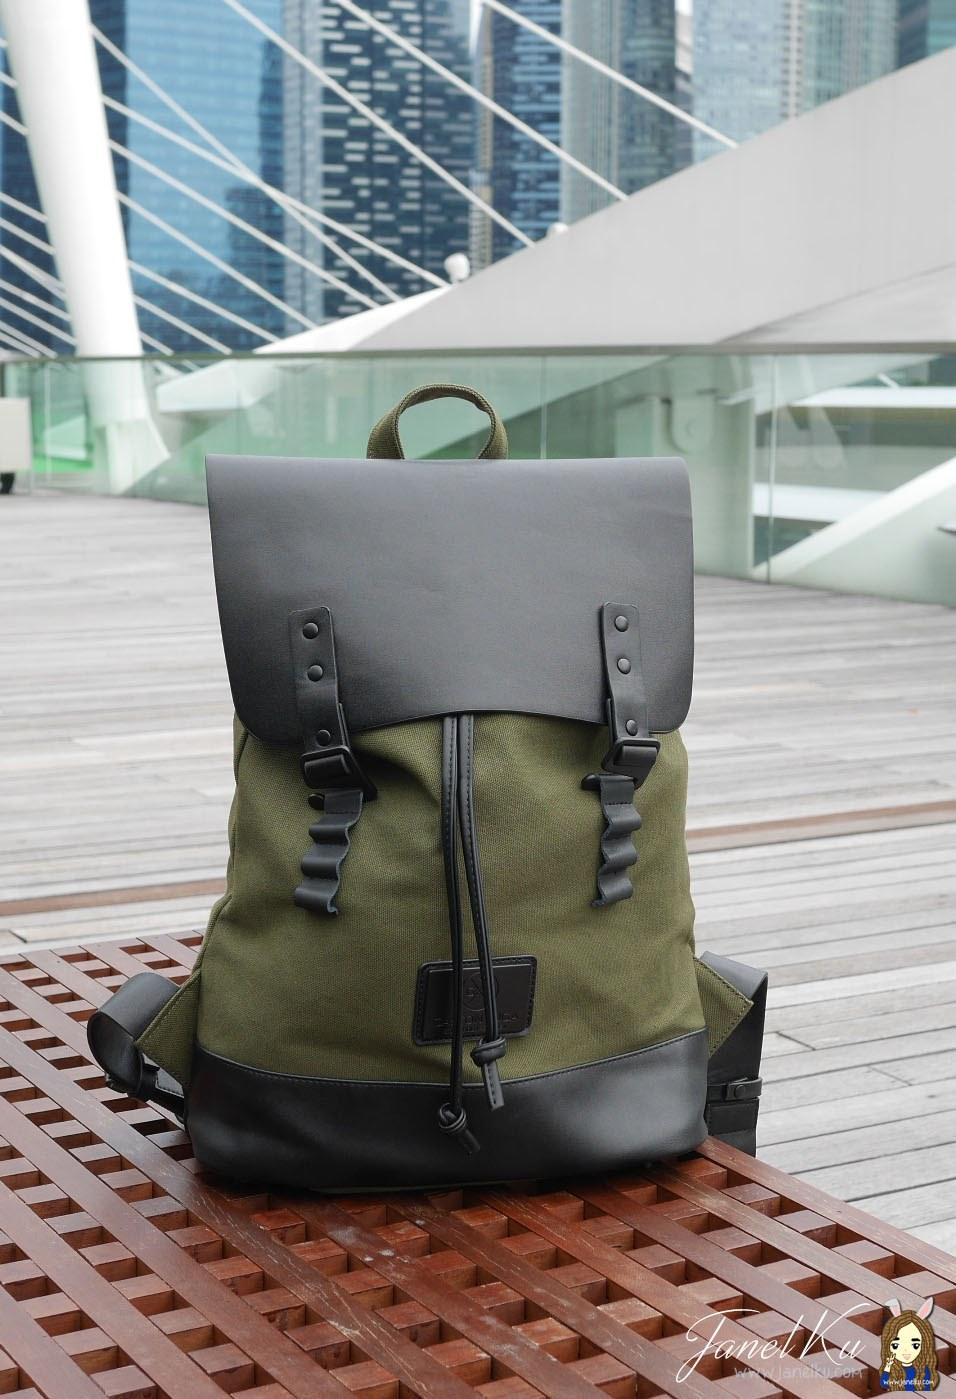 Gaston Luga: A Swedish Take on the Modern Fashionista's Backpack